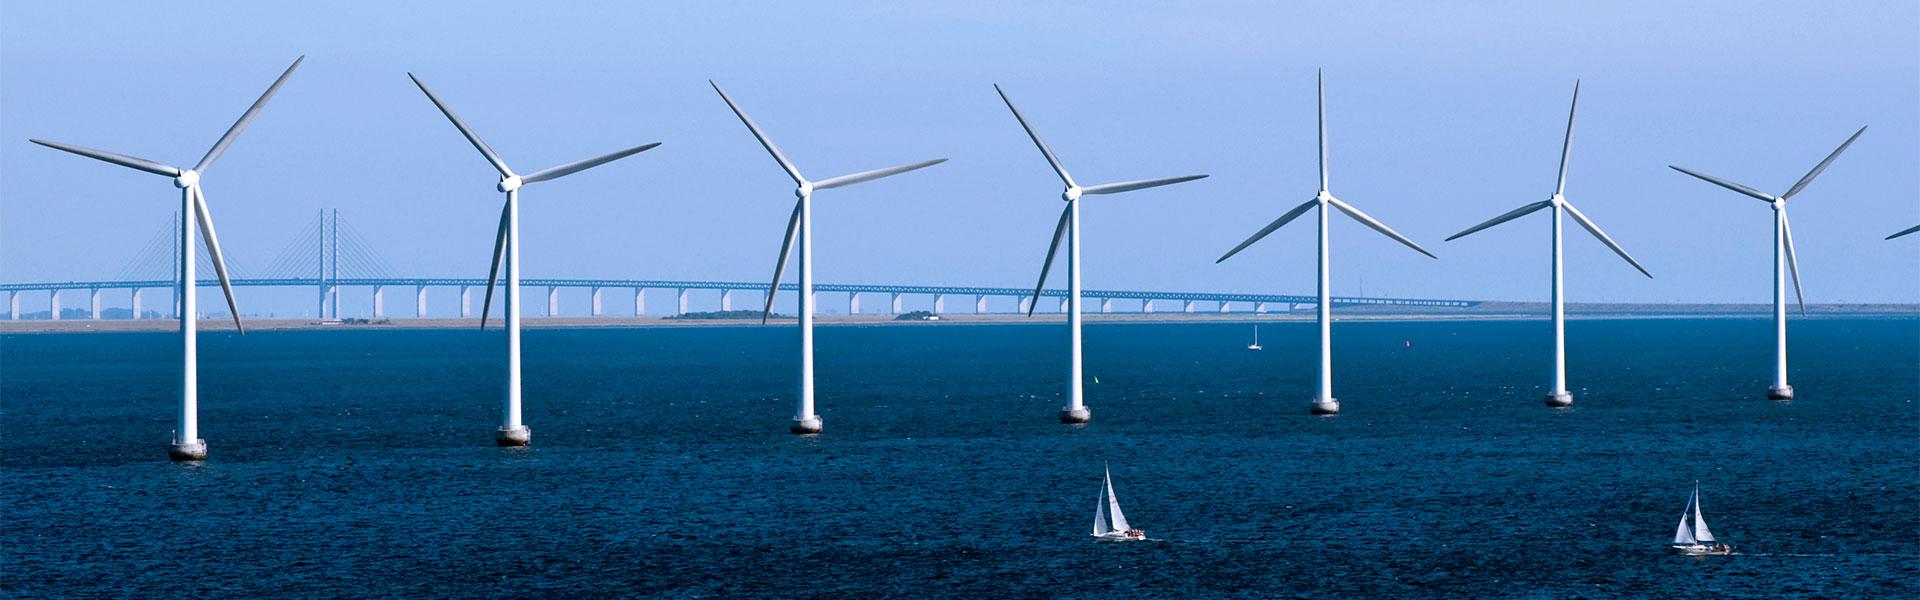 Windmills Offshore